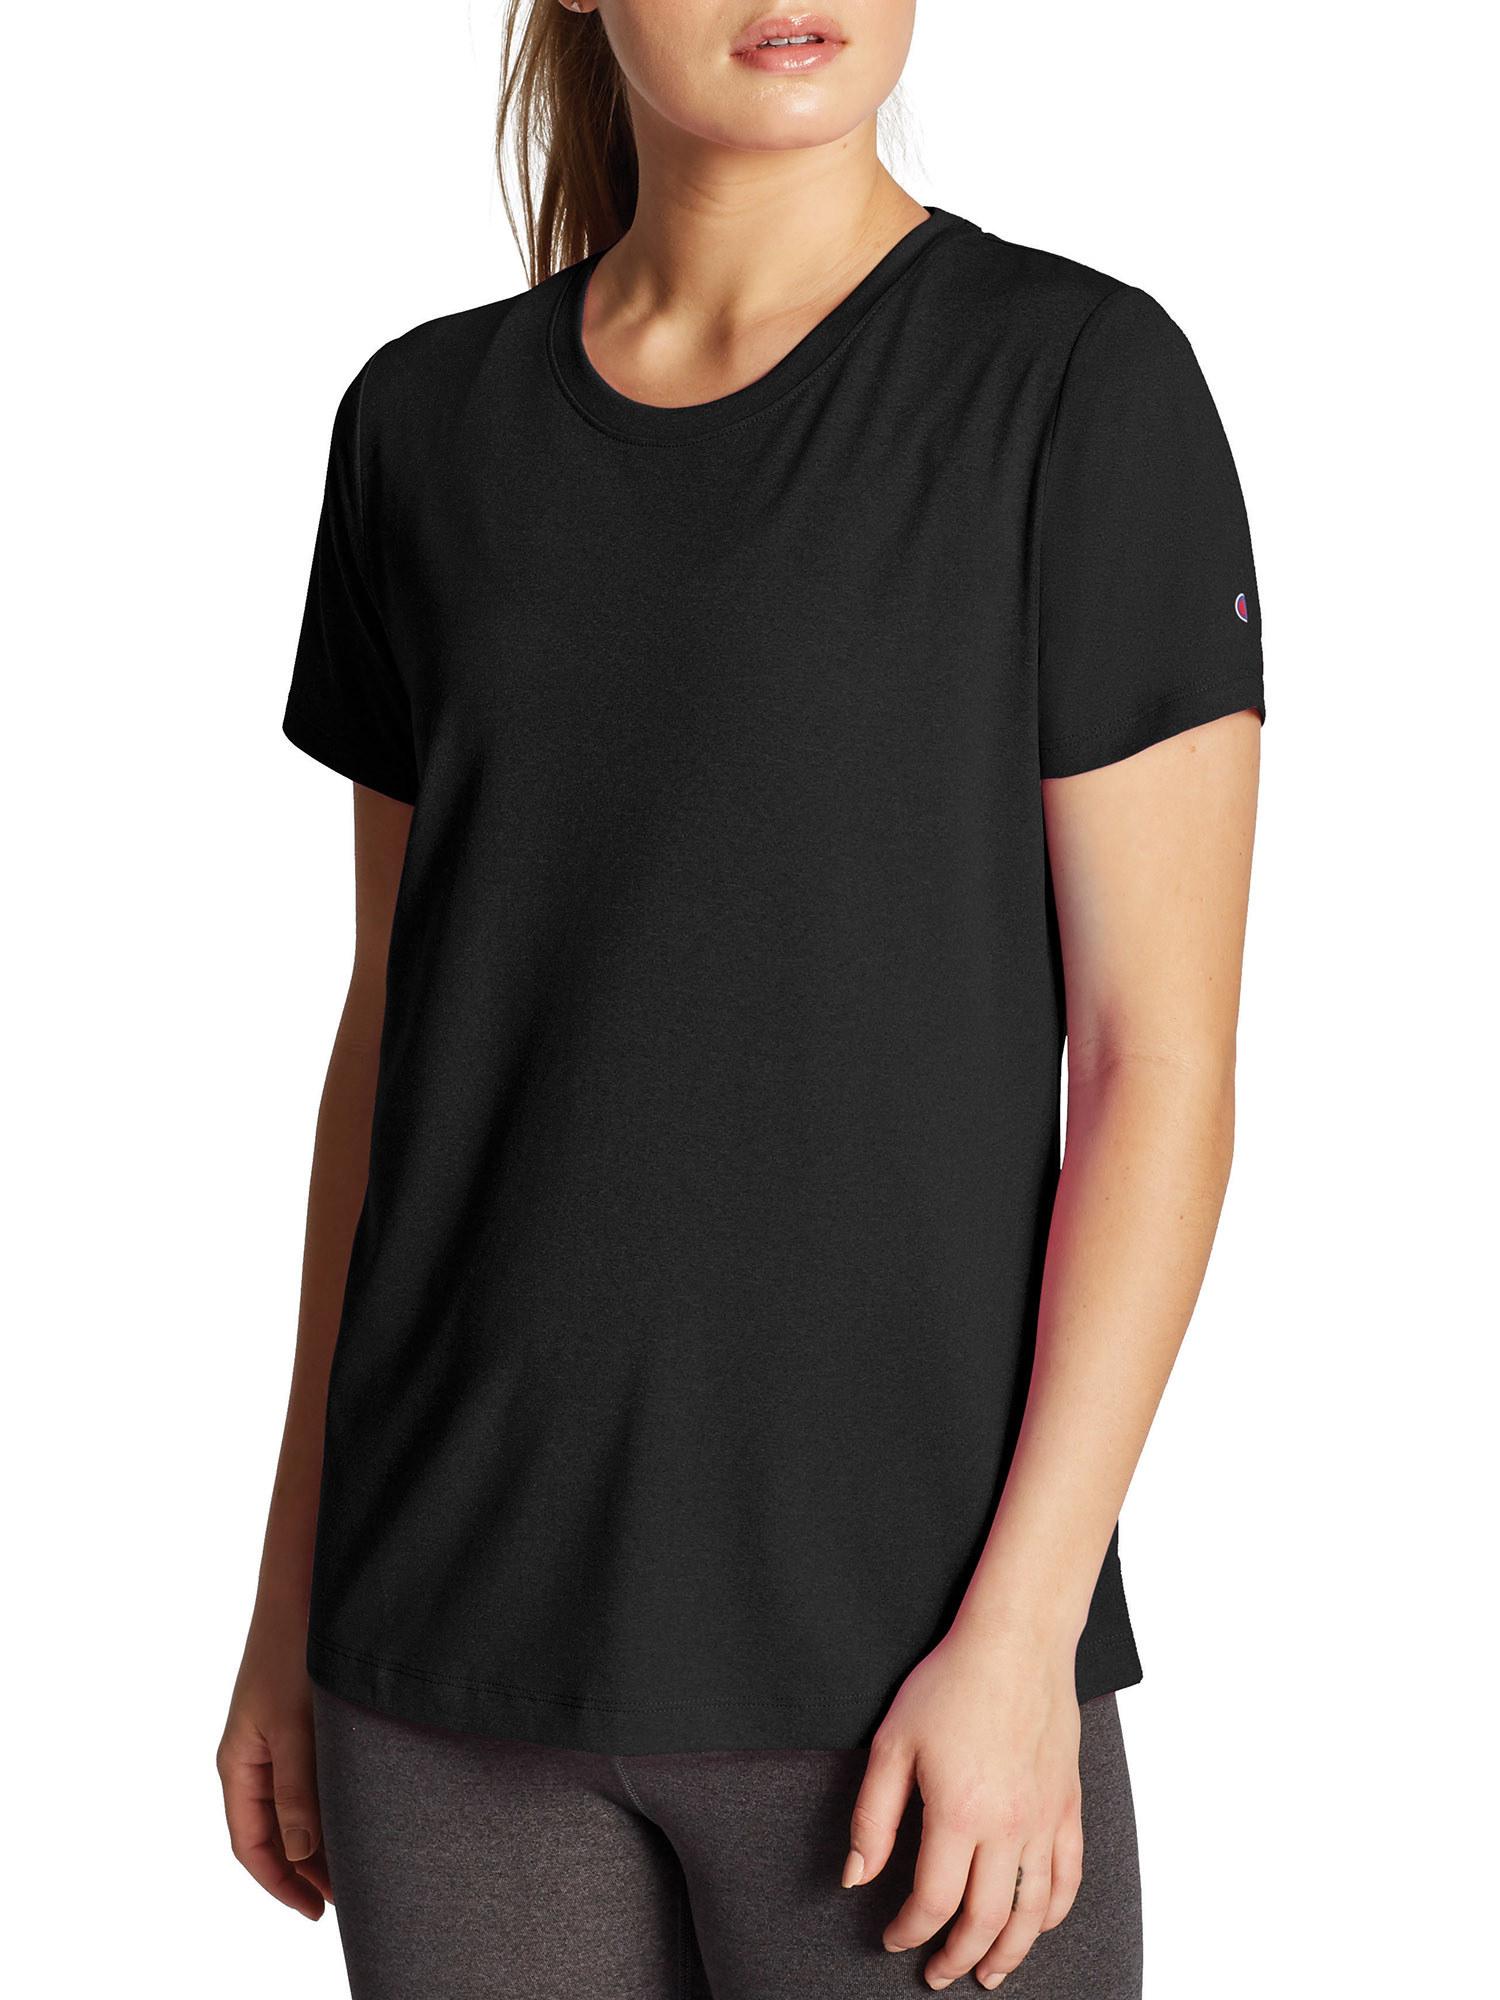 model wearing the black t-shirt